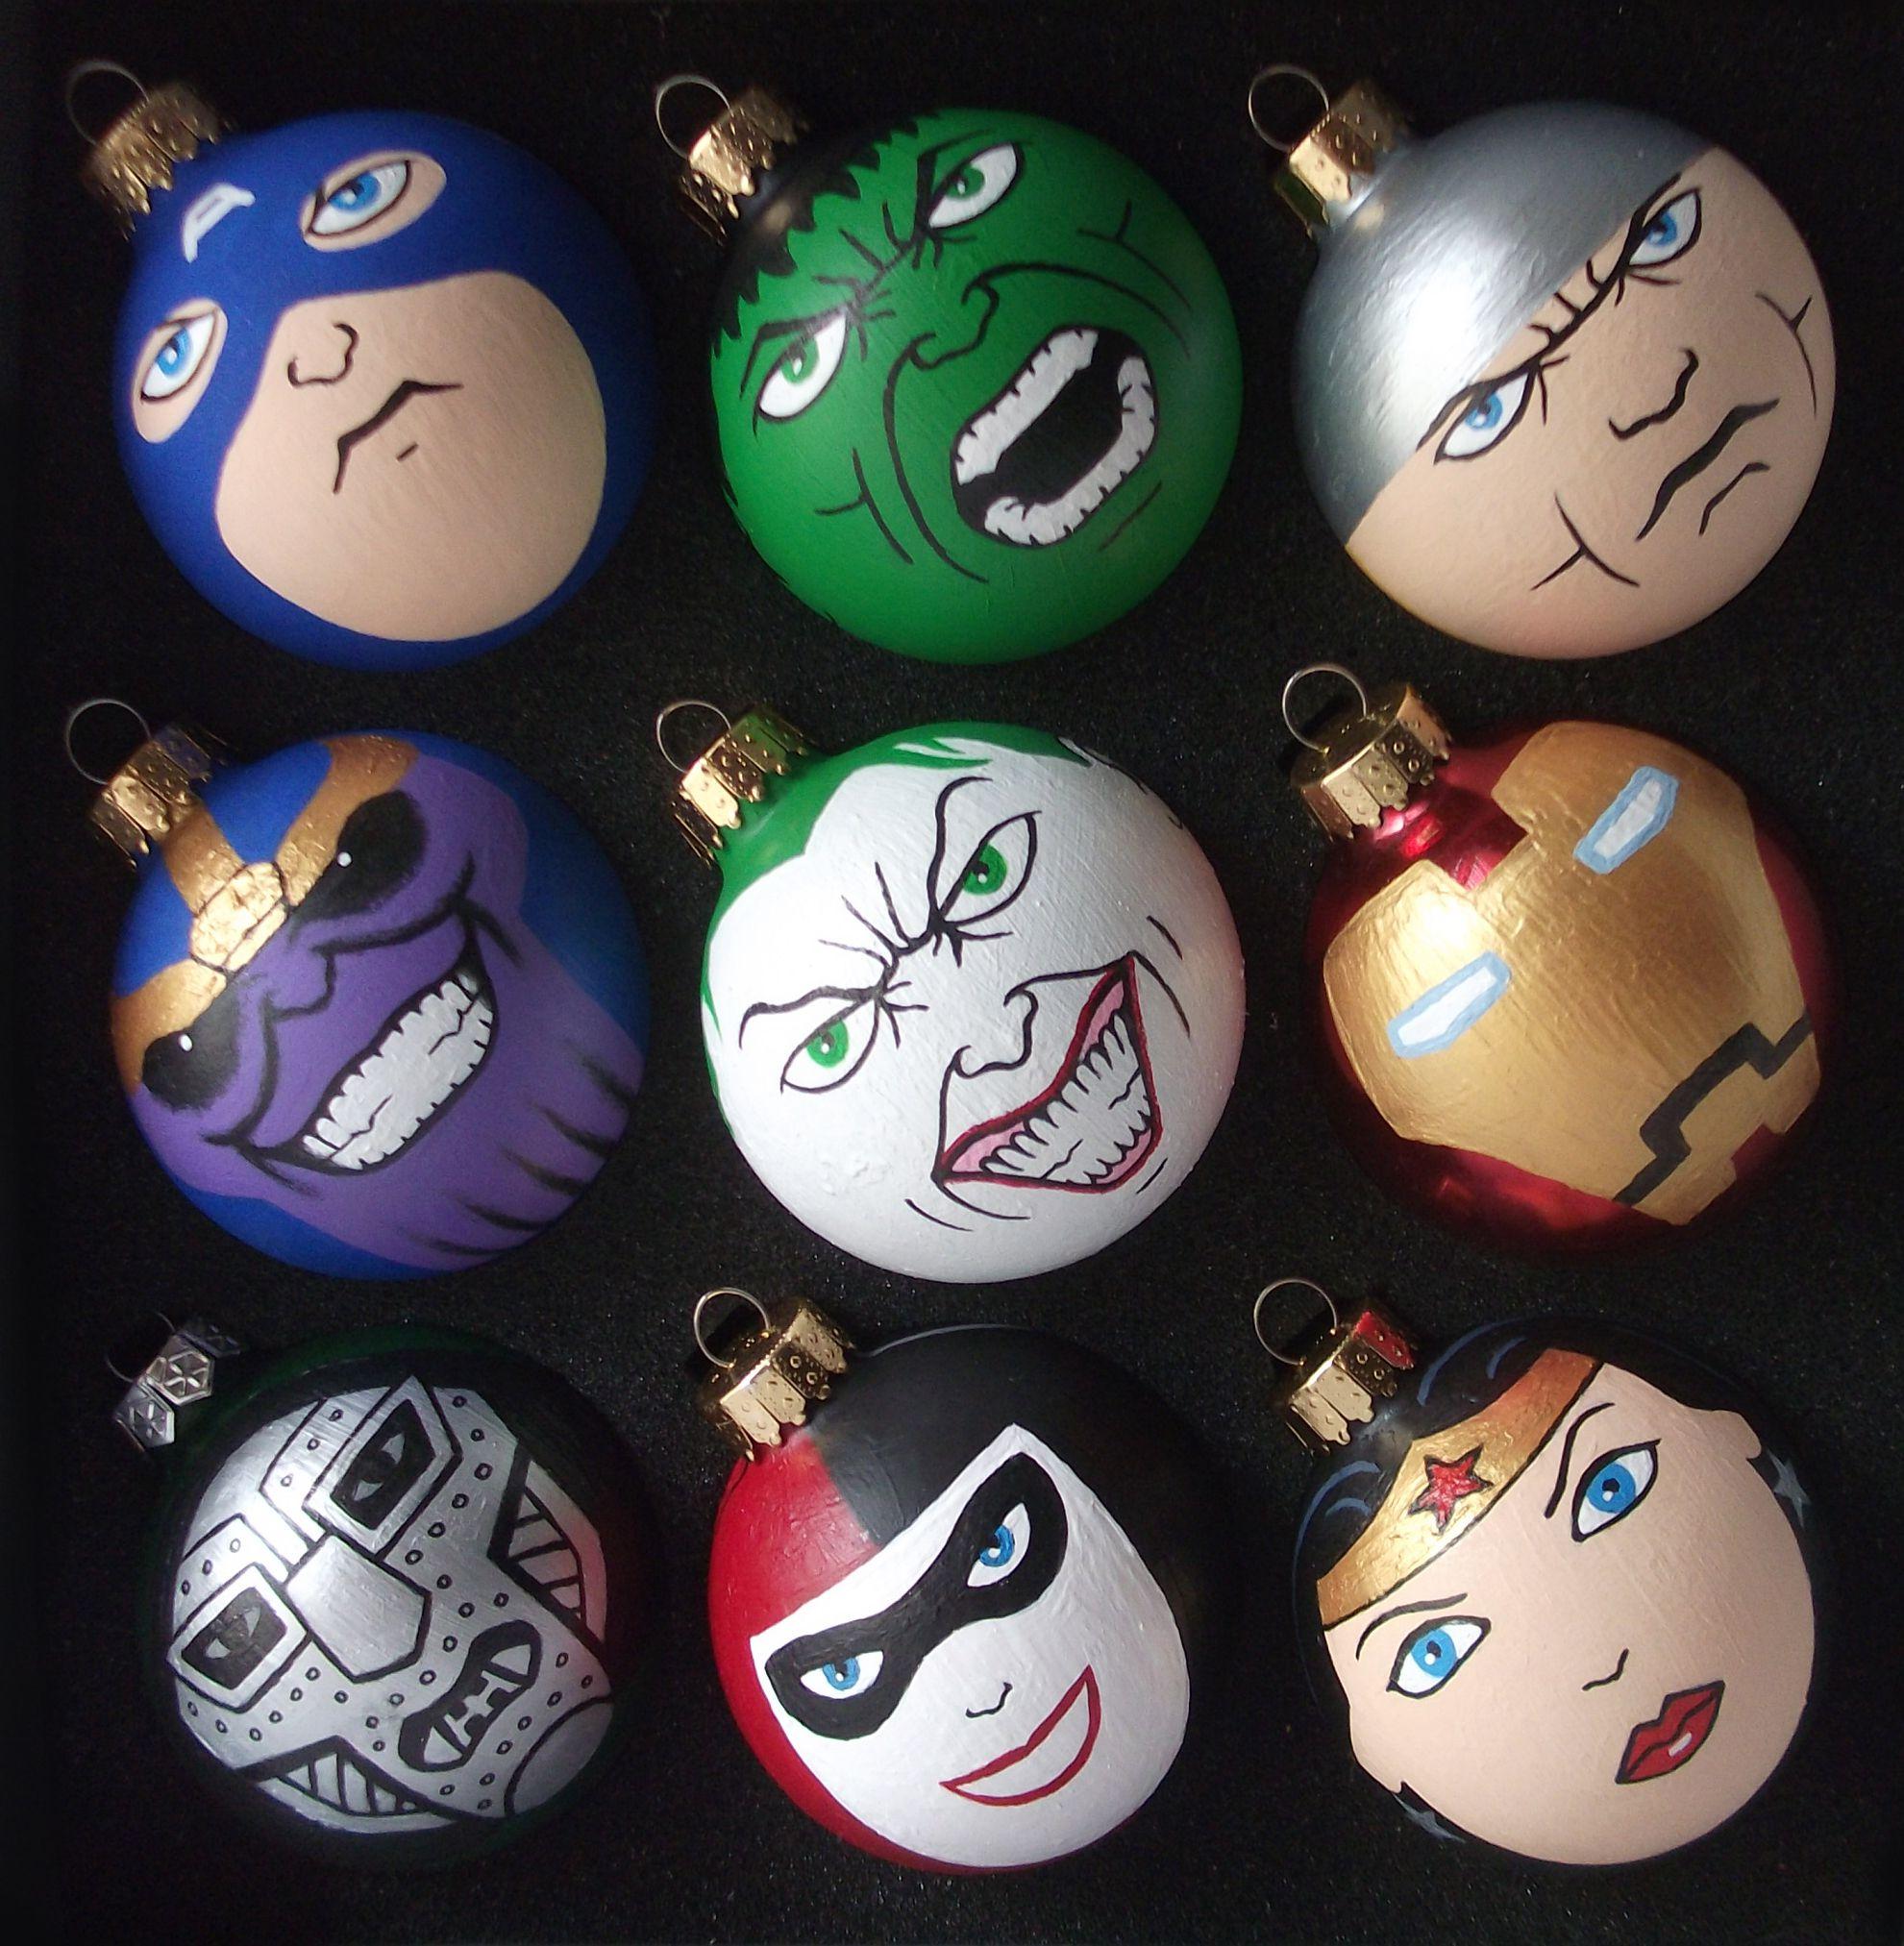 Make Christmas Super Awesome With These Diy Superhero Christmas Ornaments!